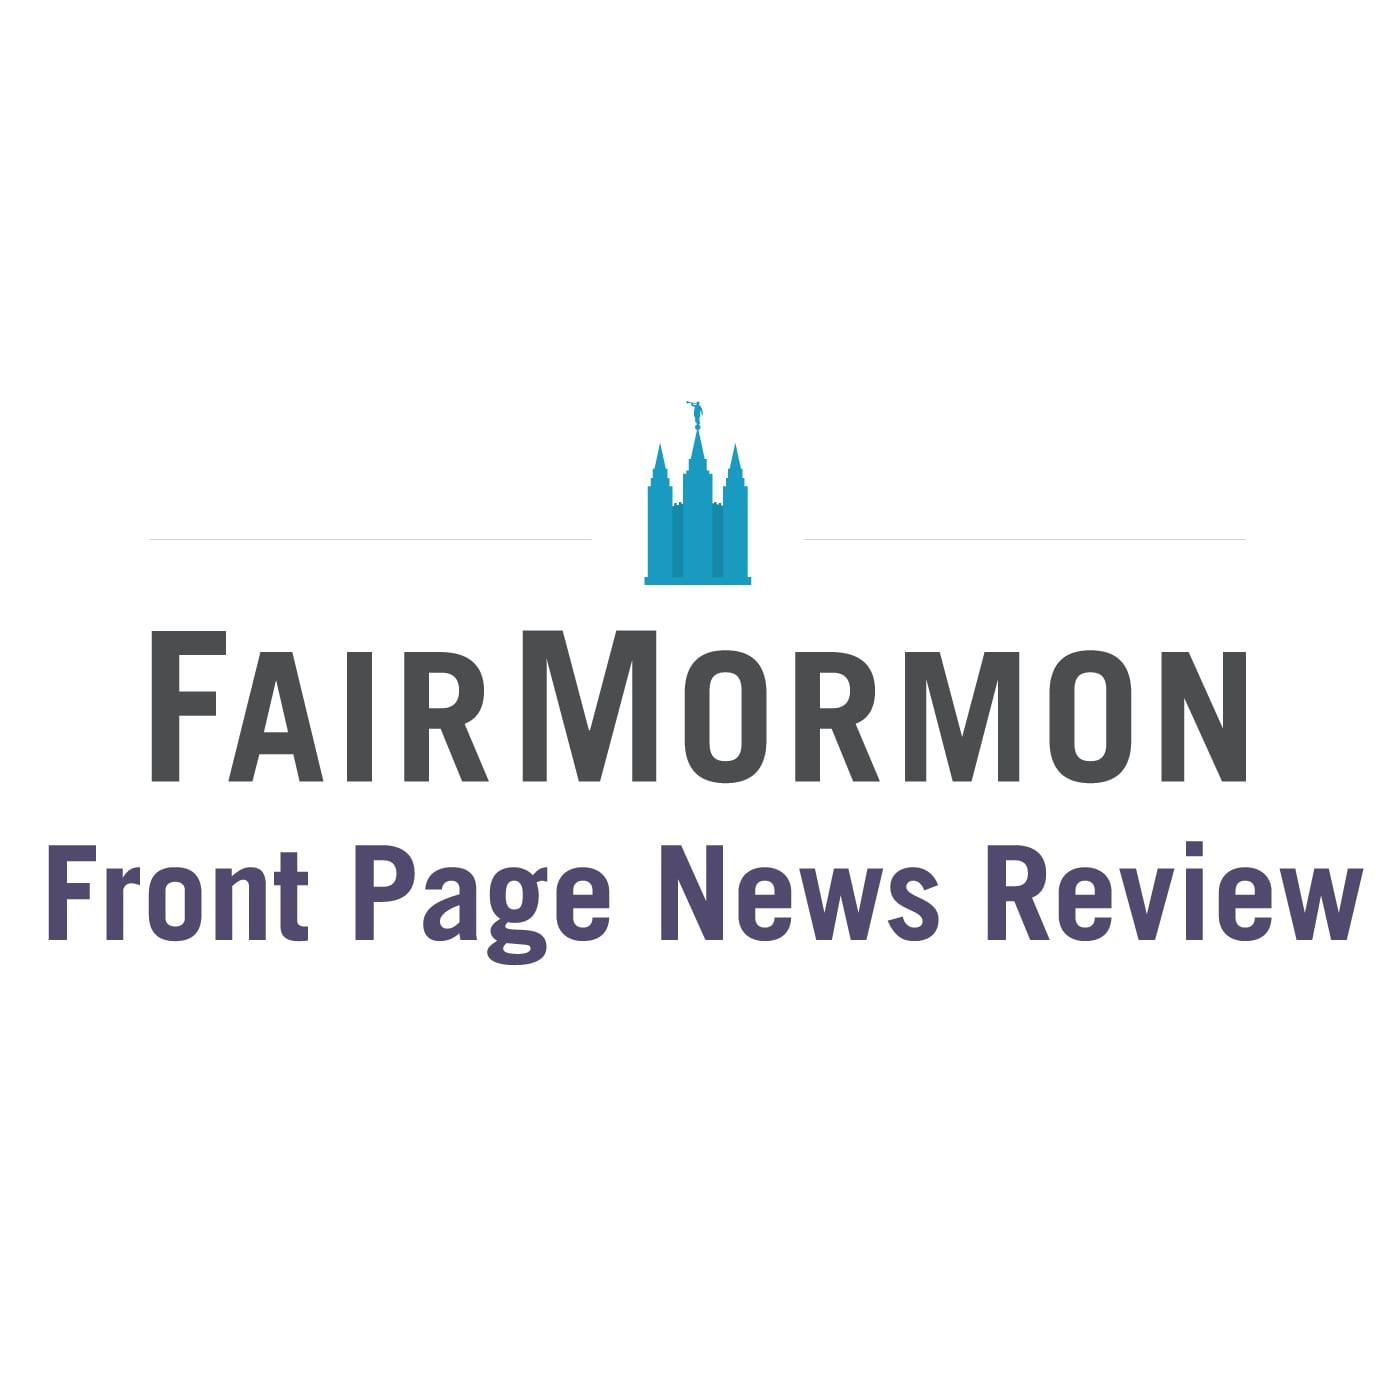 FairMormon Front Page News Review